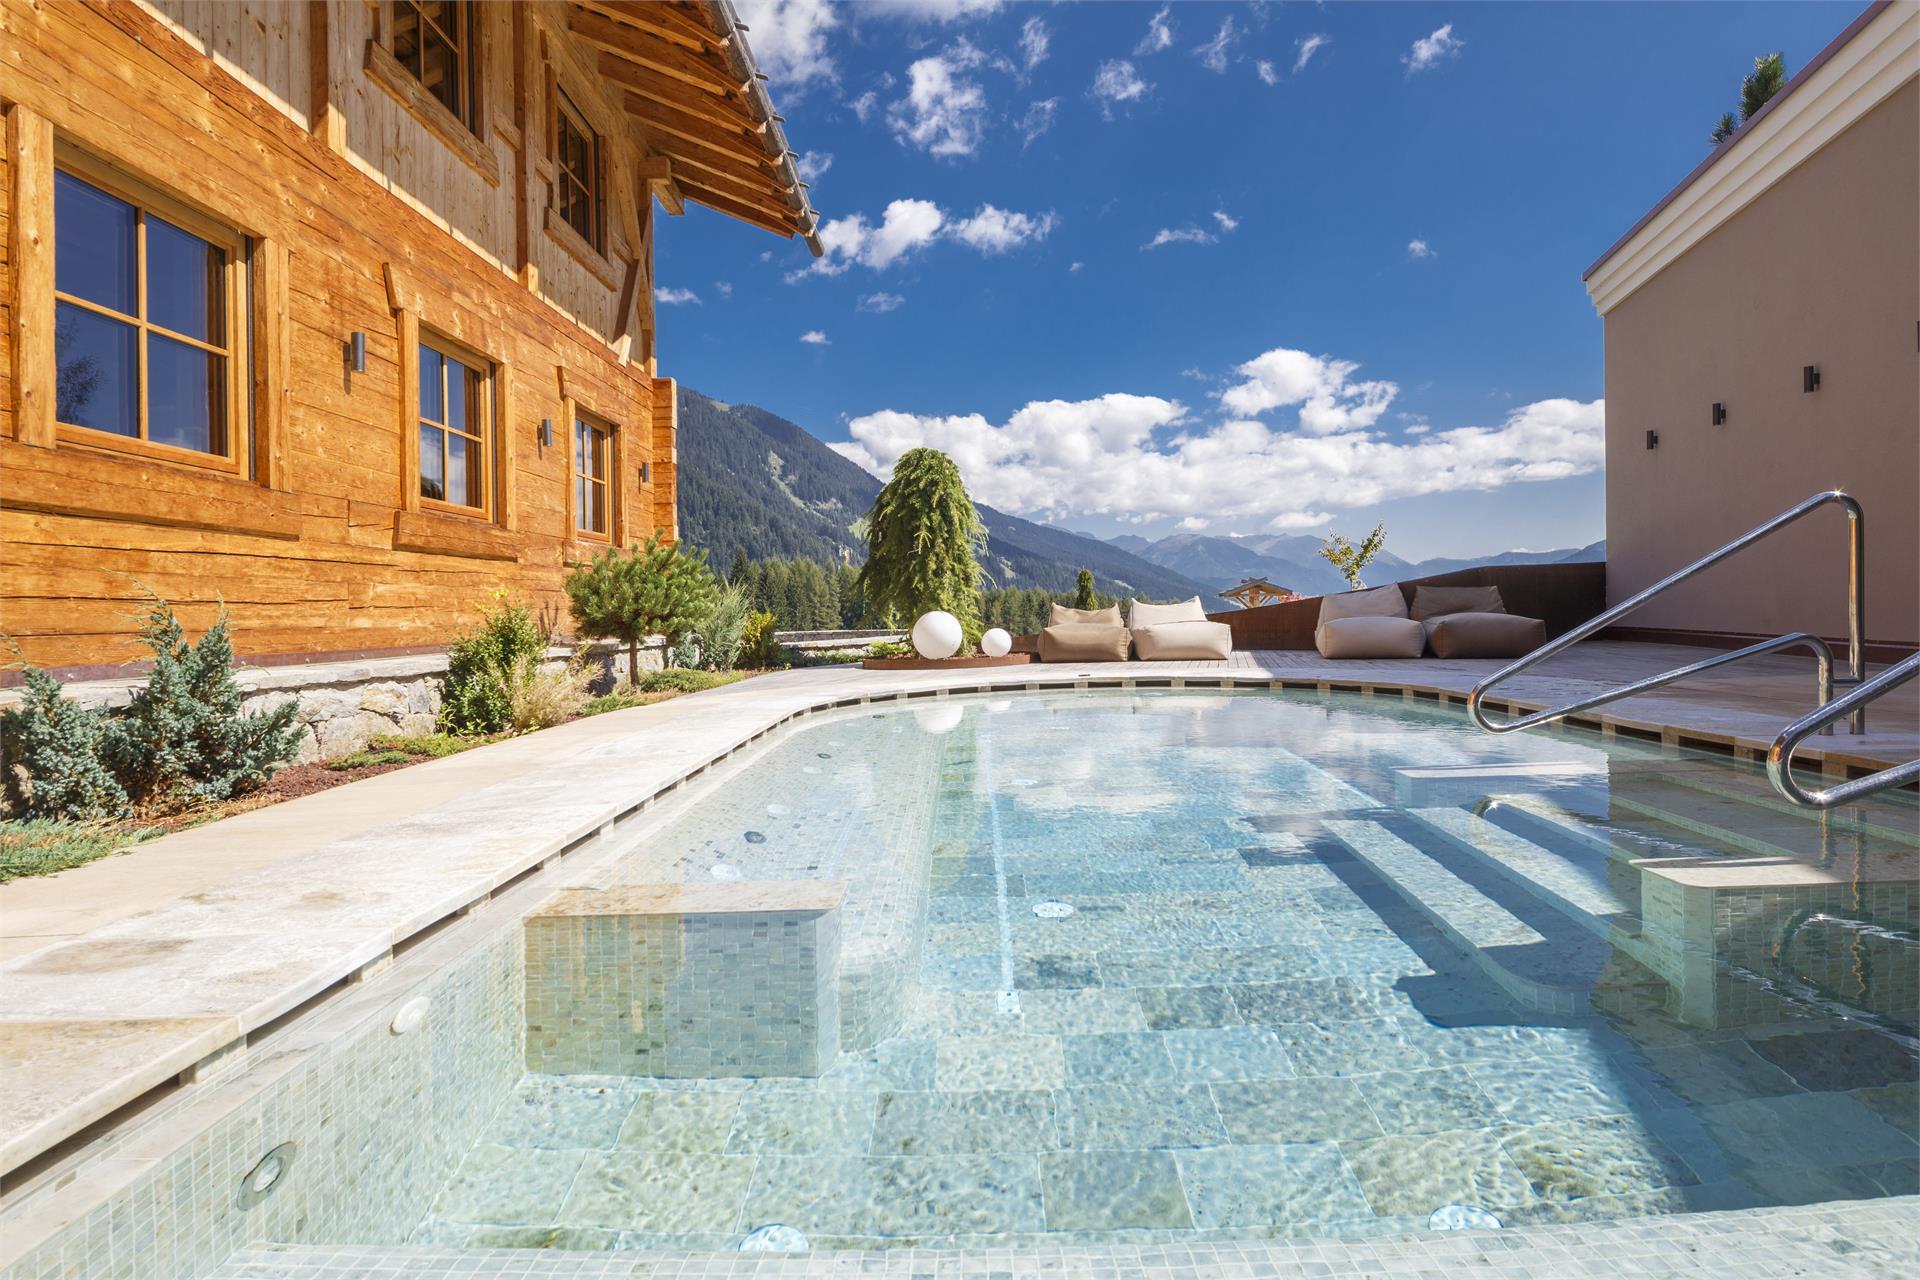 Salzsee mit Knappenhaus (Sauna & Relax)